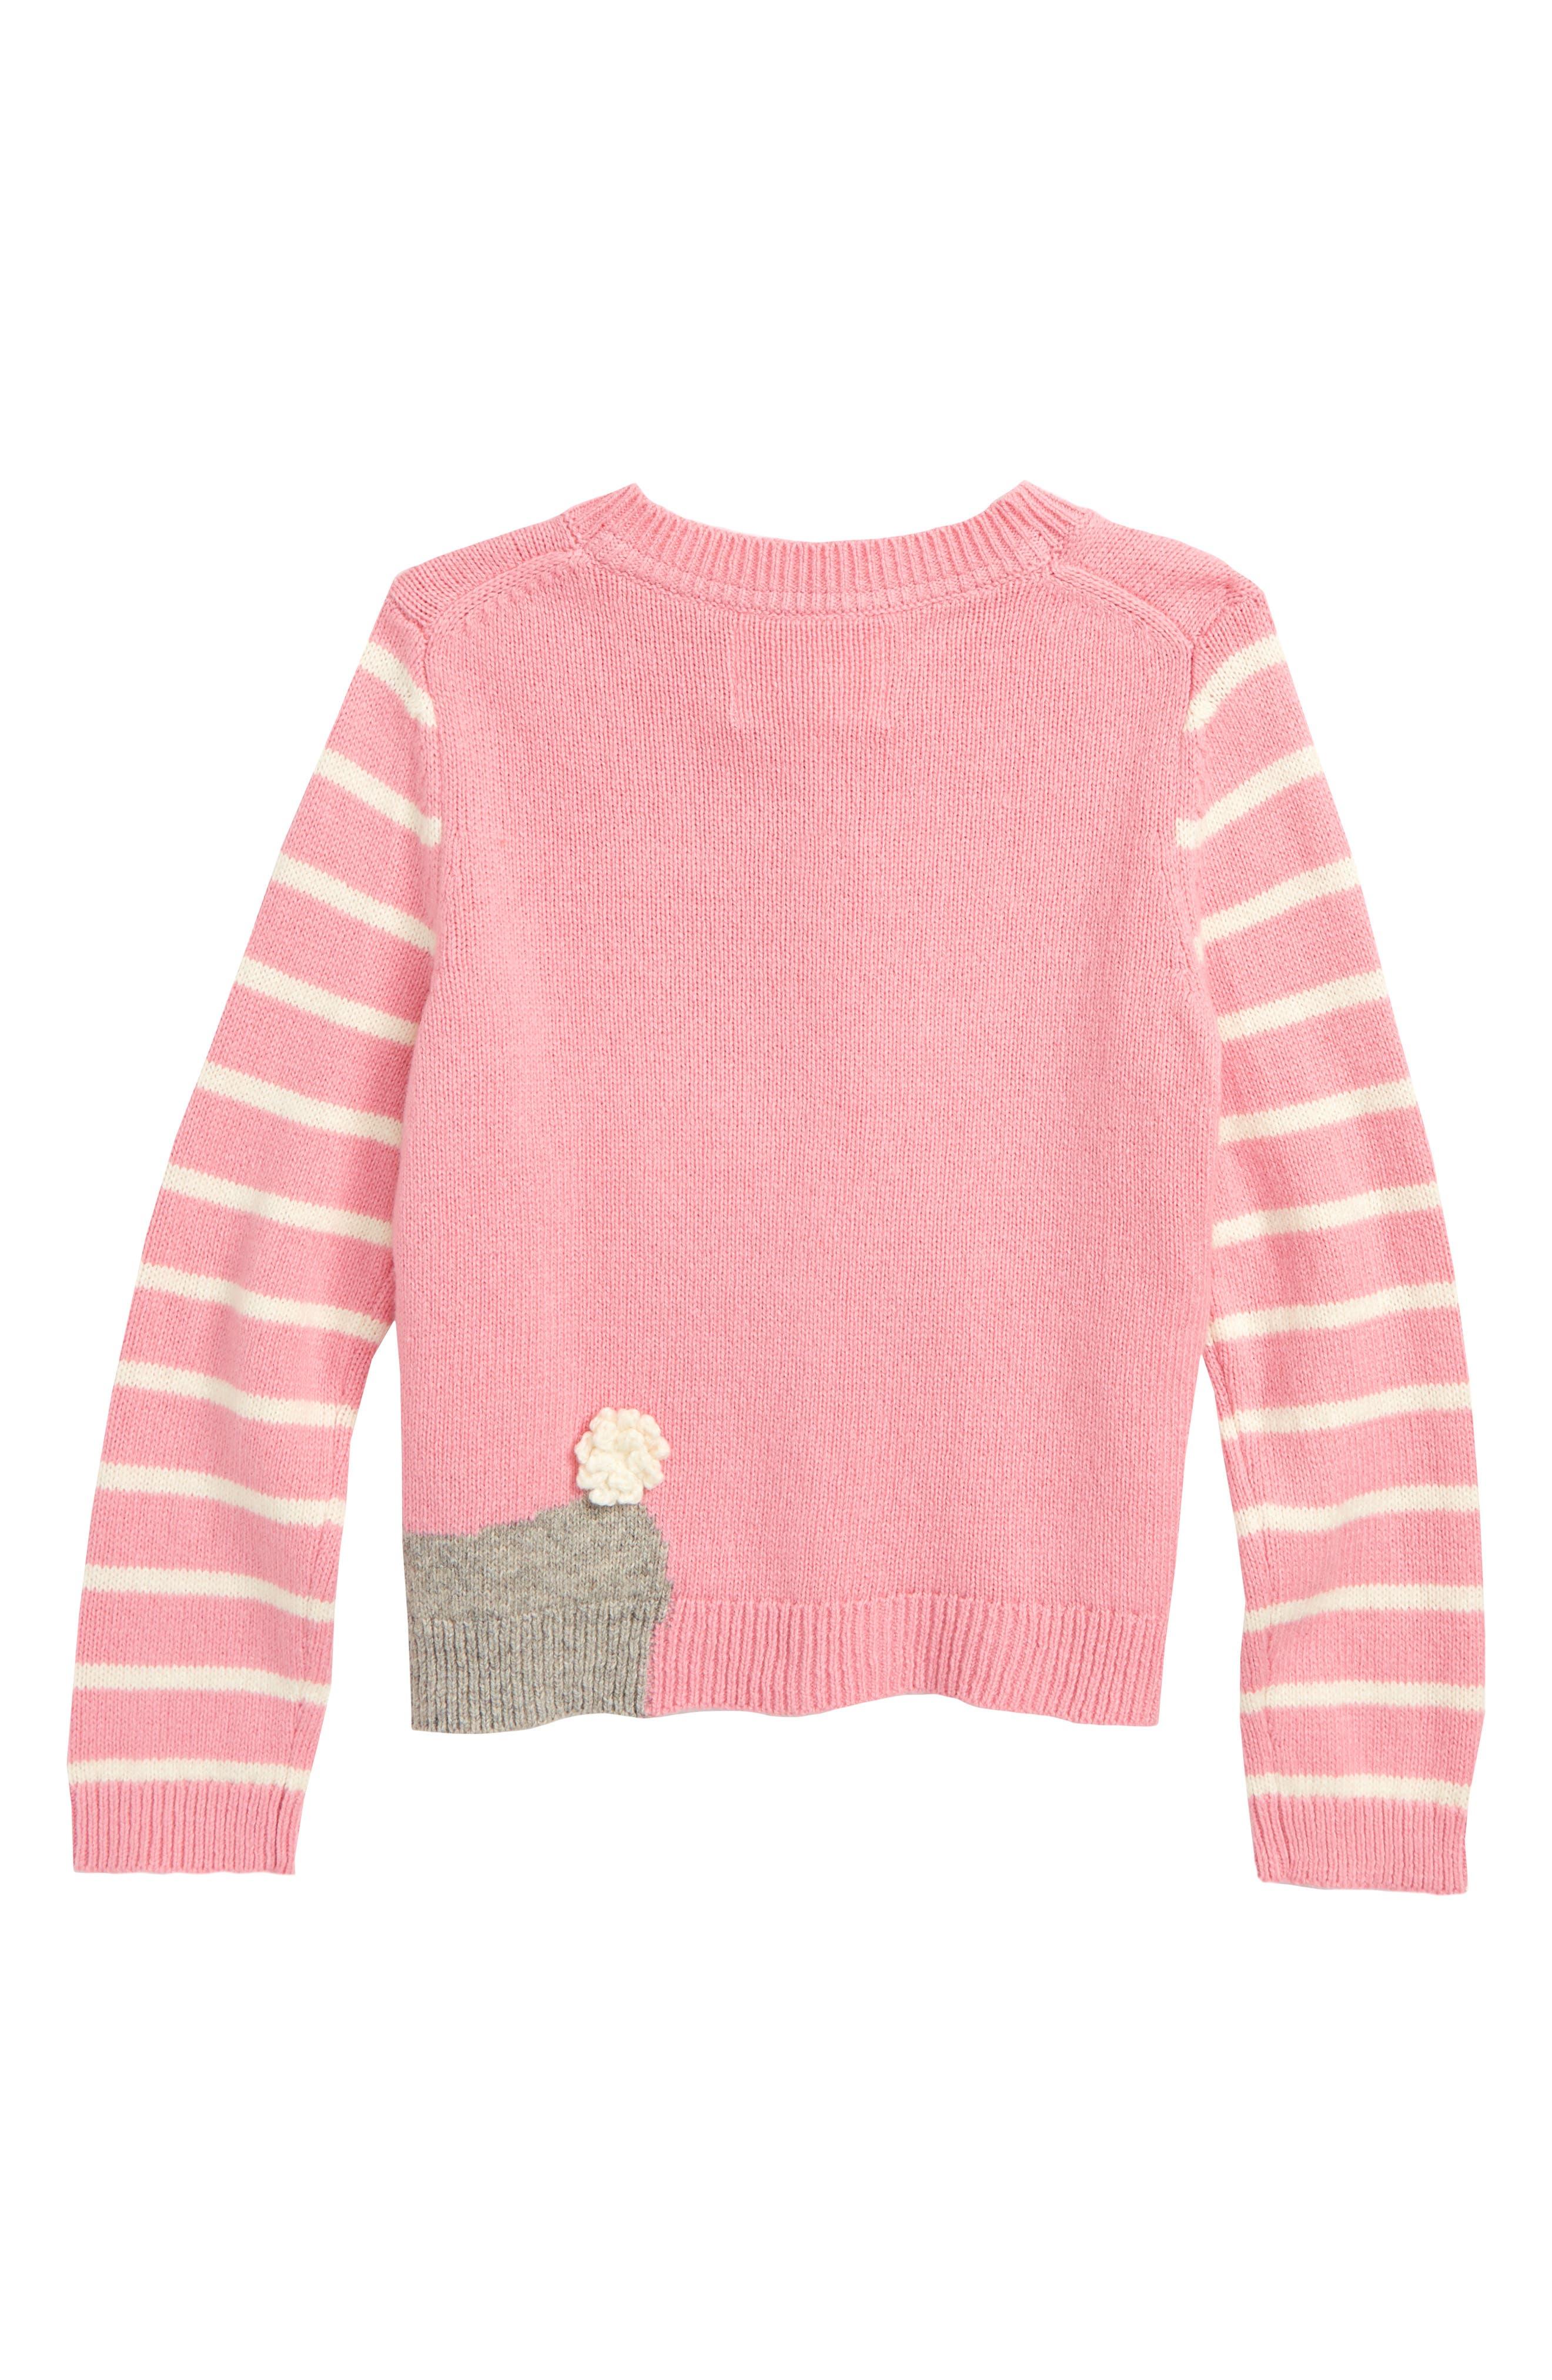 Pet Knit Cardigan,                             Alternate thumbnail 2, color,                             PNK FORMICA PINK POODLE